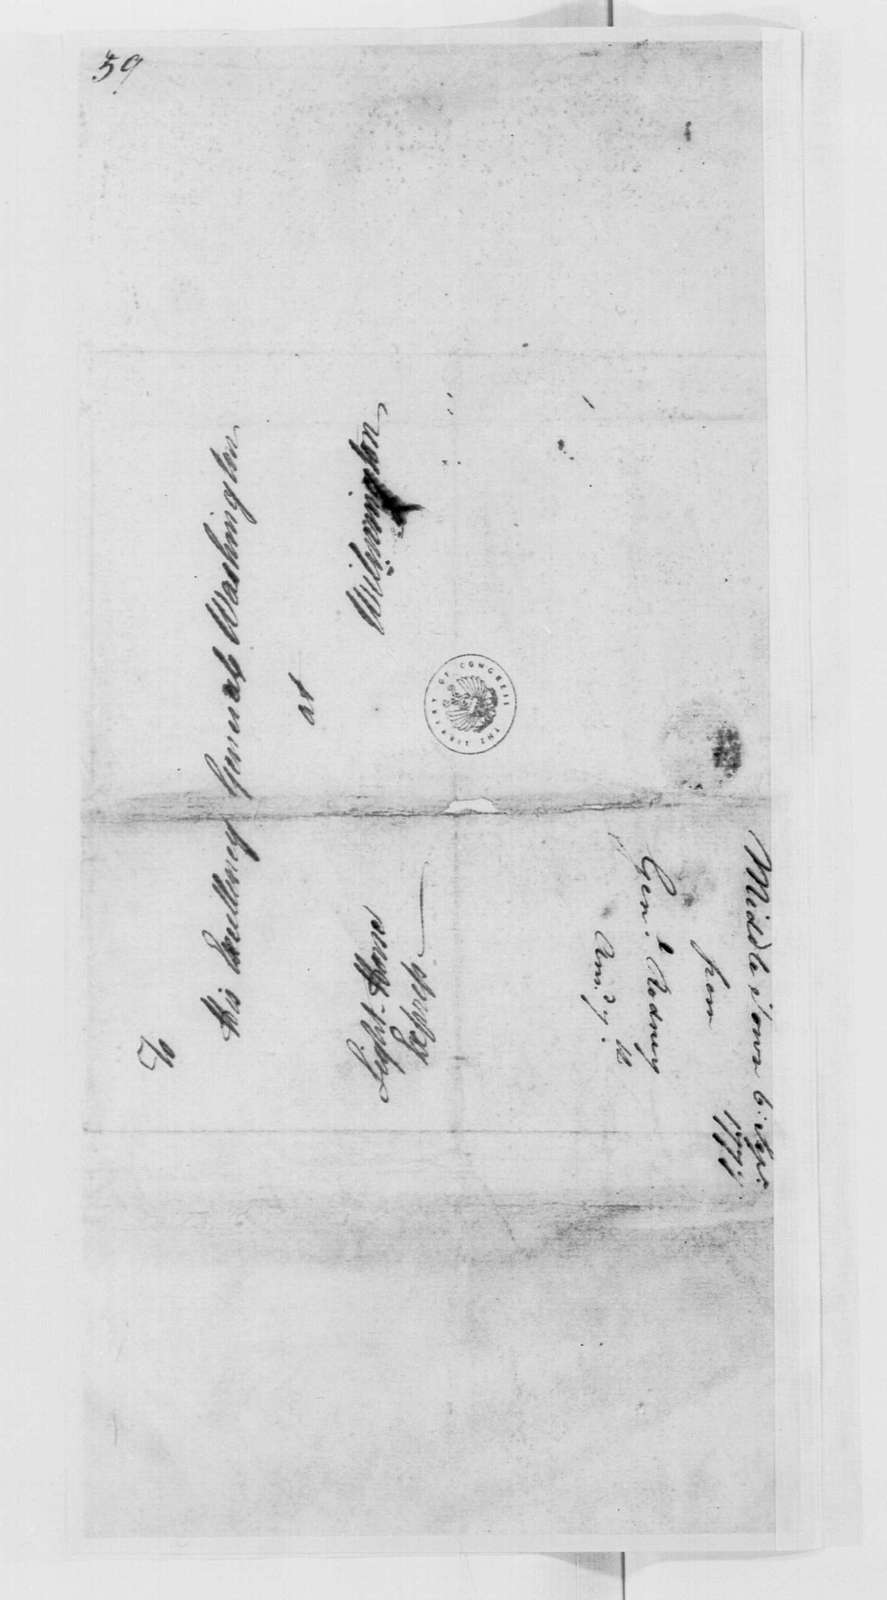 George Washington Papers, Series 4, General Correspondence: Caesar Rodney to George Washington, September 6, 1777